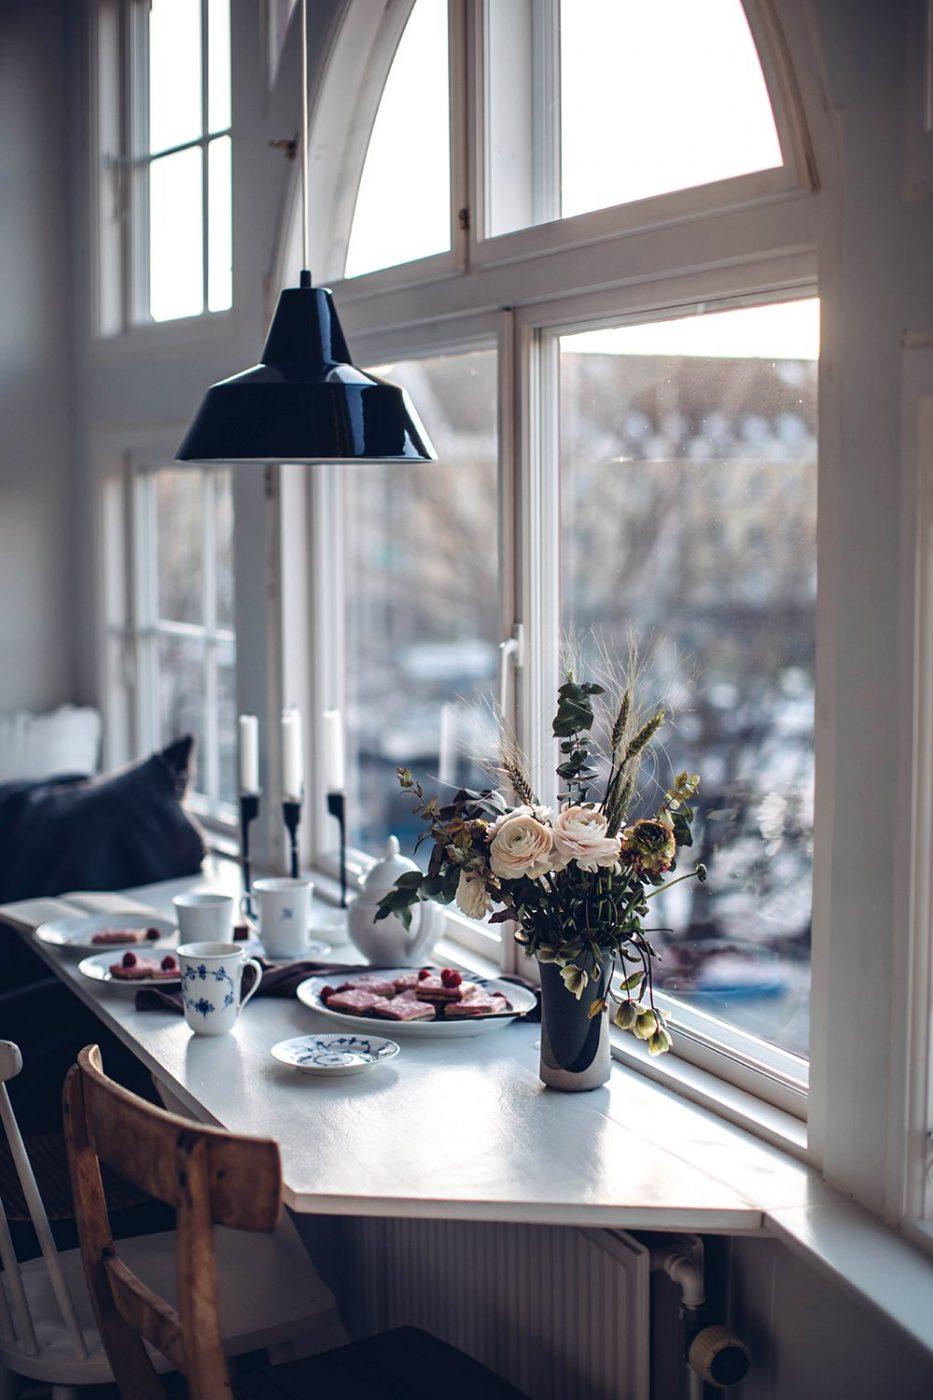 Image for Gluten-free Hindbærsnitter in Copenhagen